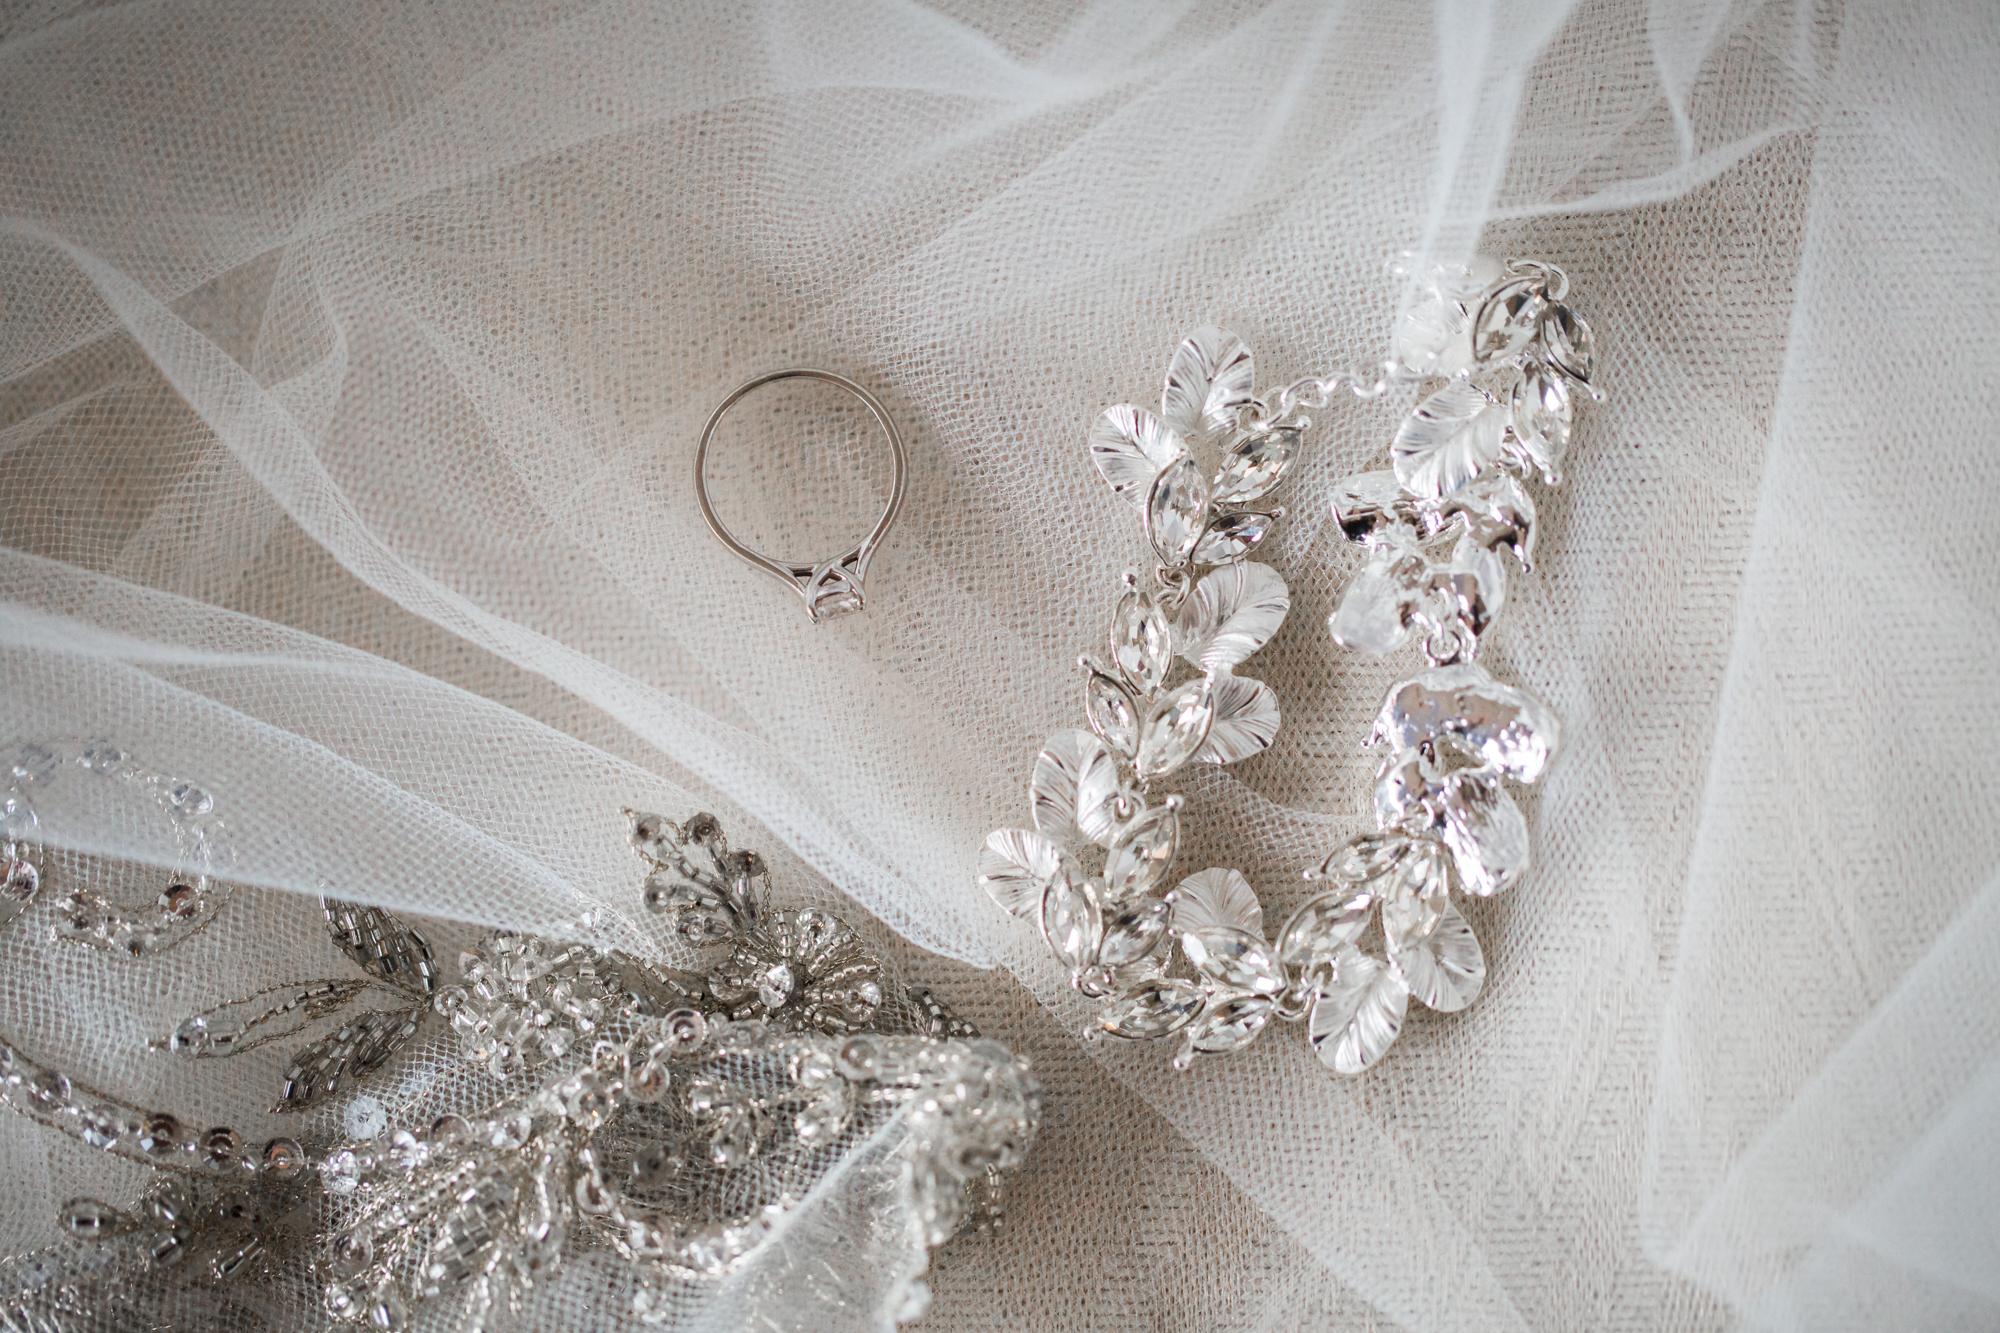 Benvenuto_Wedding_catholic_Florida_Bride-Groom-1-2.jpg